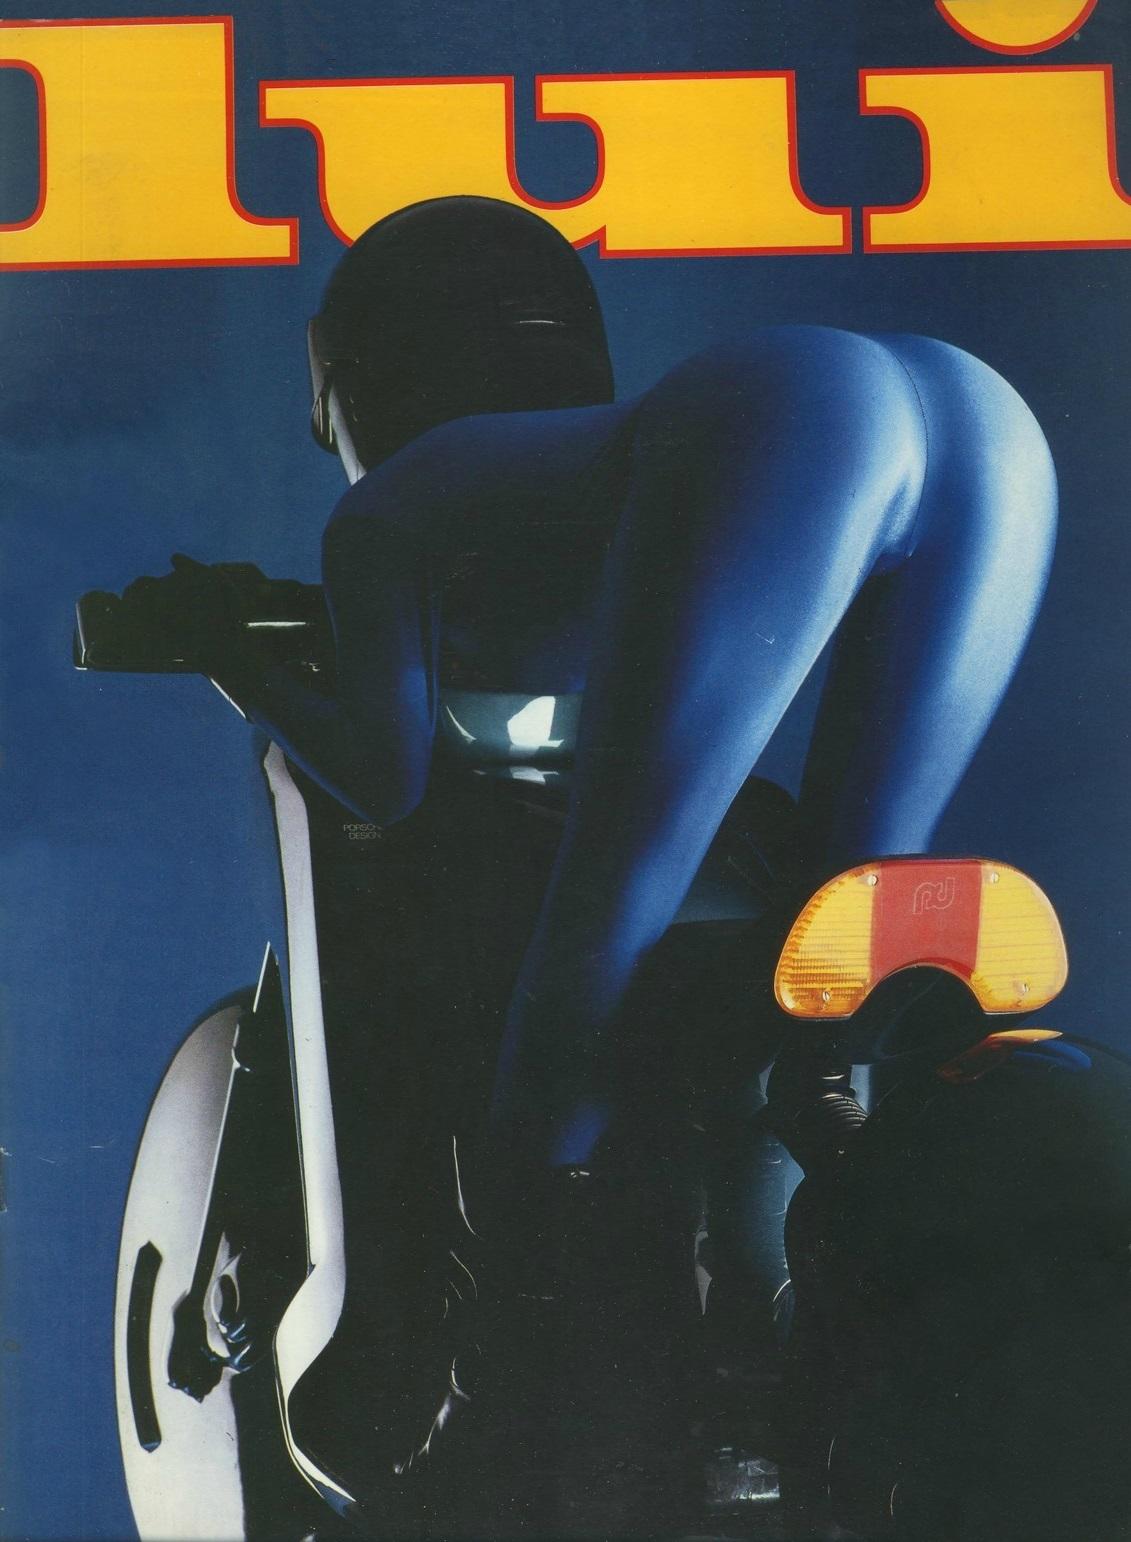 tumblr n0yfpoAIvk1rz2j56o1 1280 biker Photography NeSFW Lui Magazine cover